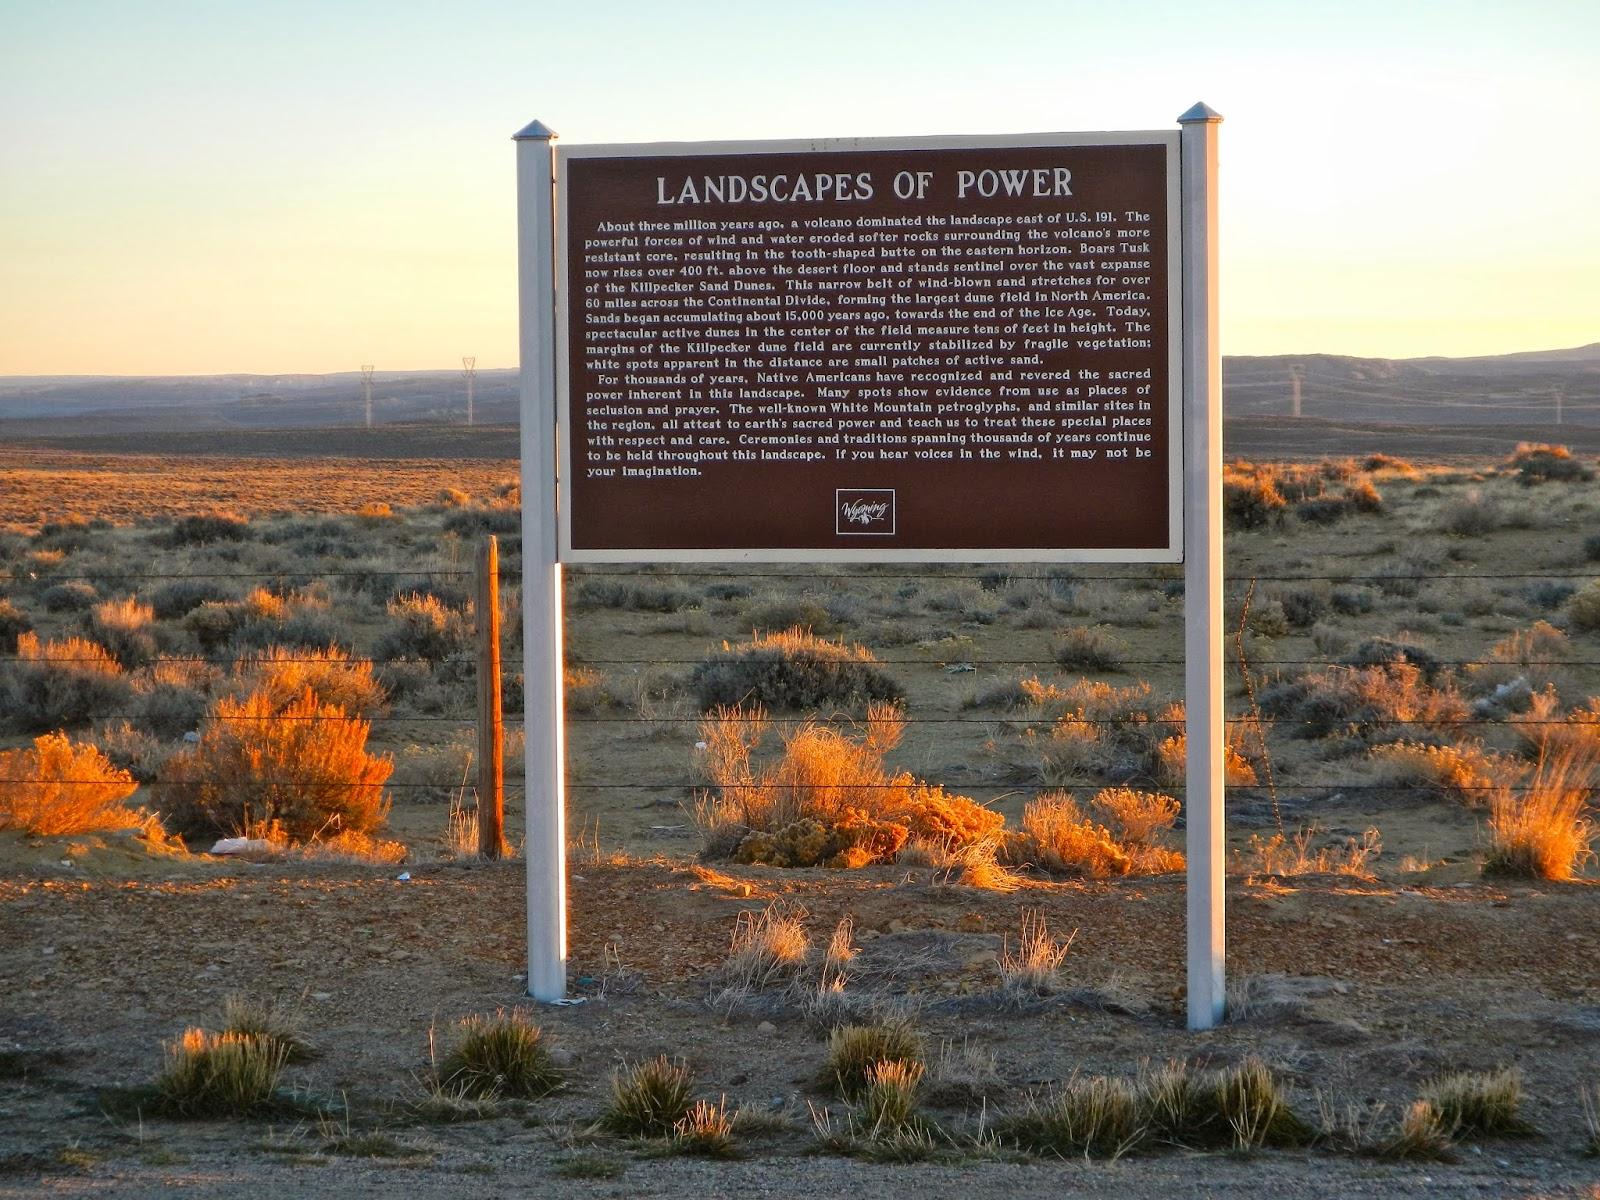 Bar X Road: Wyoming's Empty Quarter | Forrest McCarthy